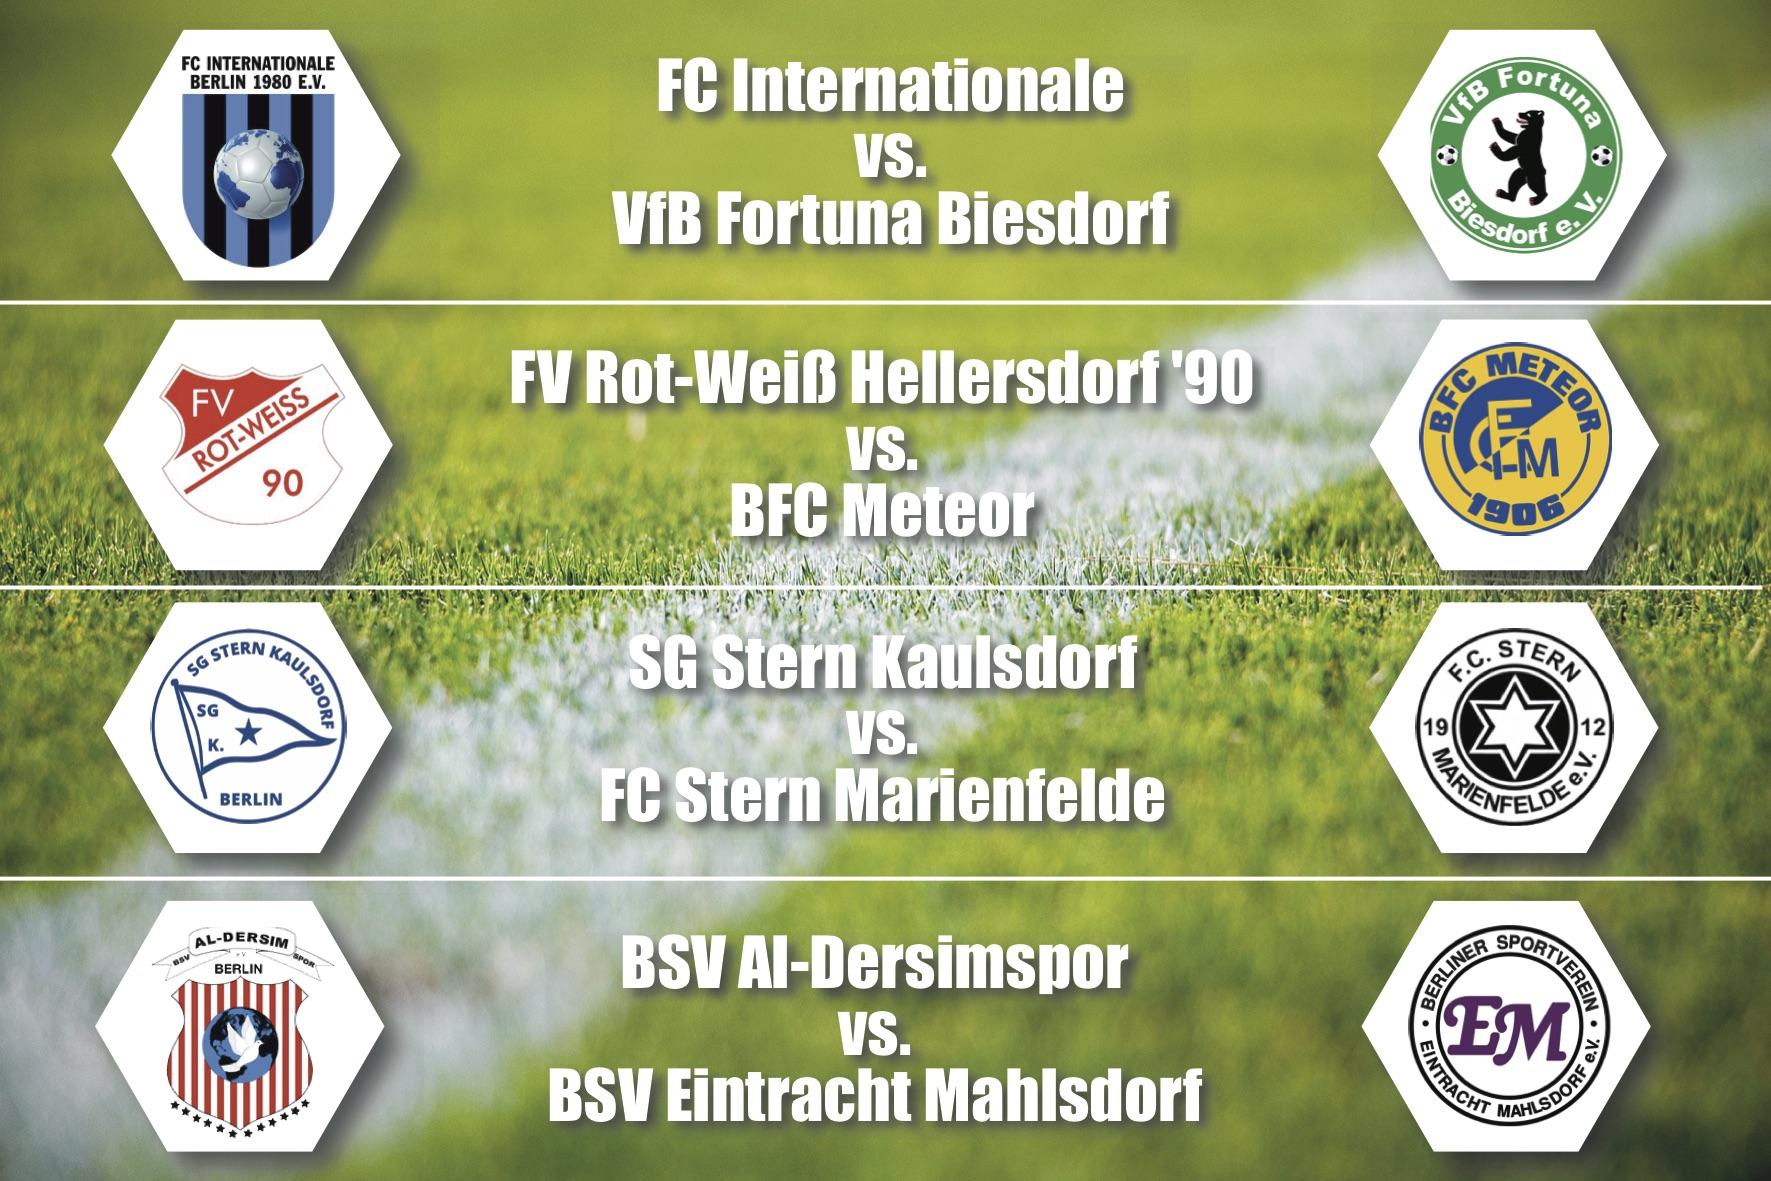 Pokal-Wochenende: FC Internationale vs. Fortuna Biesdorf, RW Hellersdorf '90 vs. BFC Meteor , Stern Kaulsdorf vs. Stern Marienfelde, Al-Dersimspor vs. Eintracht Mahlsdorf